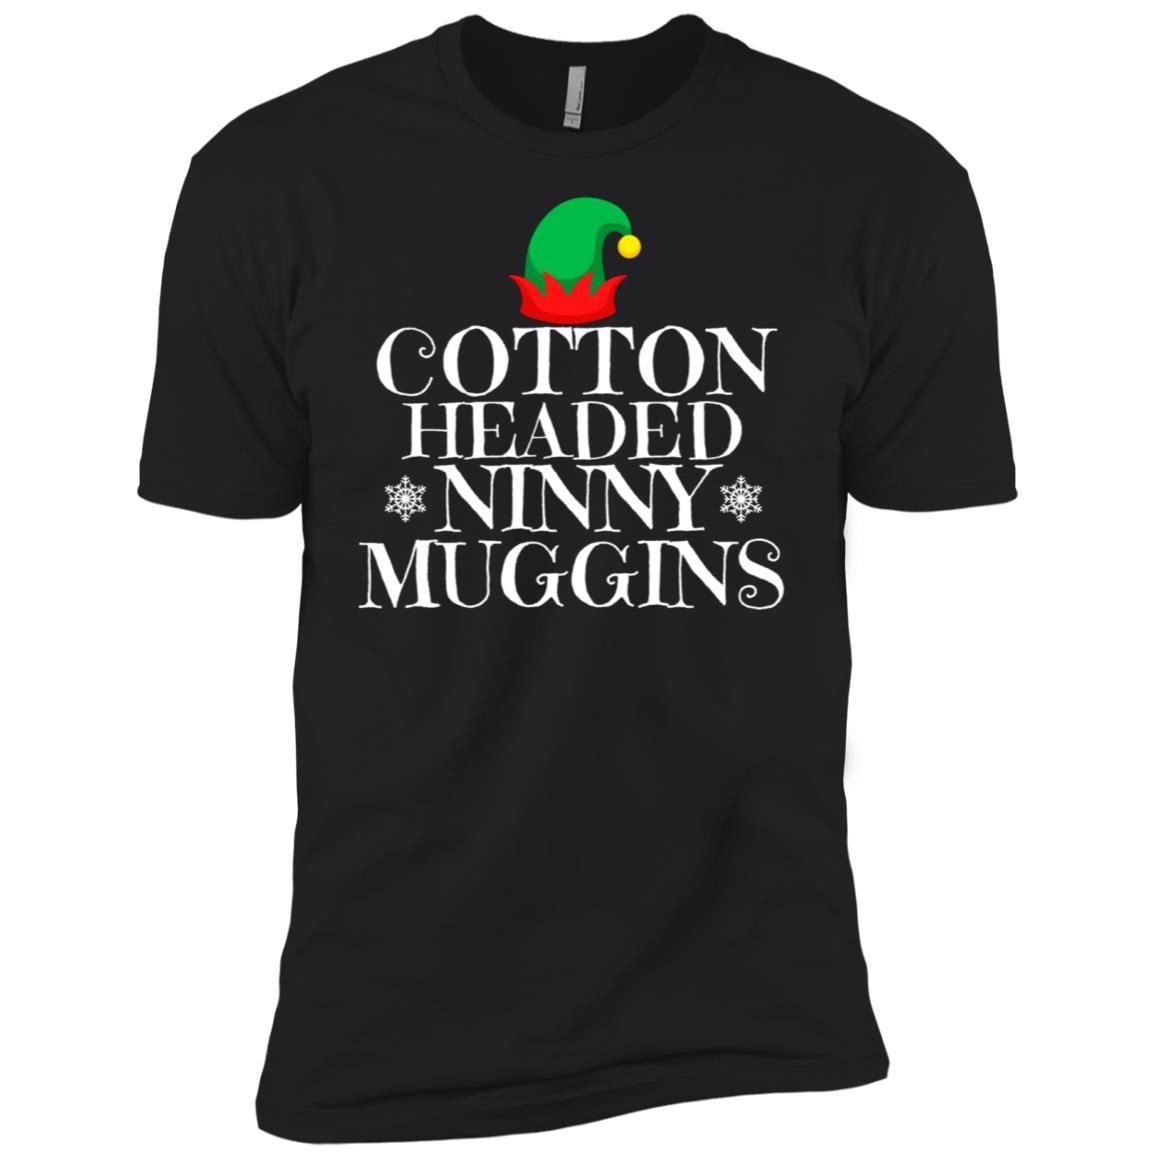 Cotten headed ninny muggins novelty Christmas Tee Men Short Sleeve T-Shirt